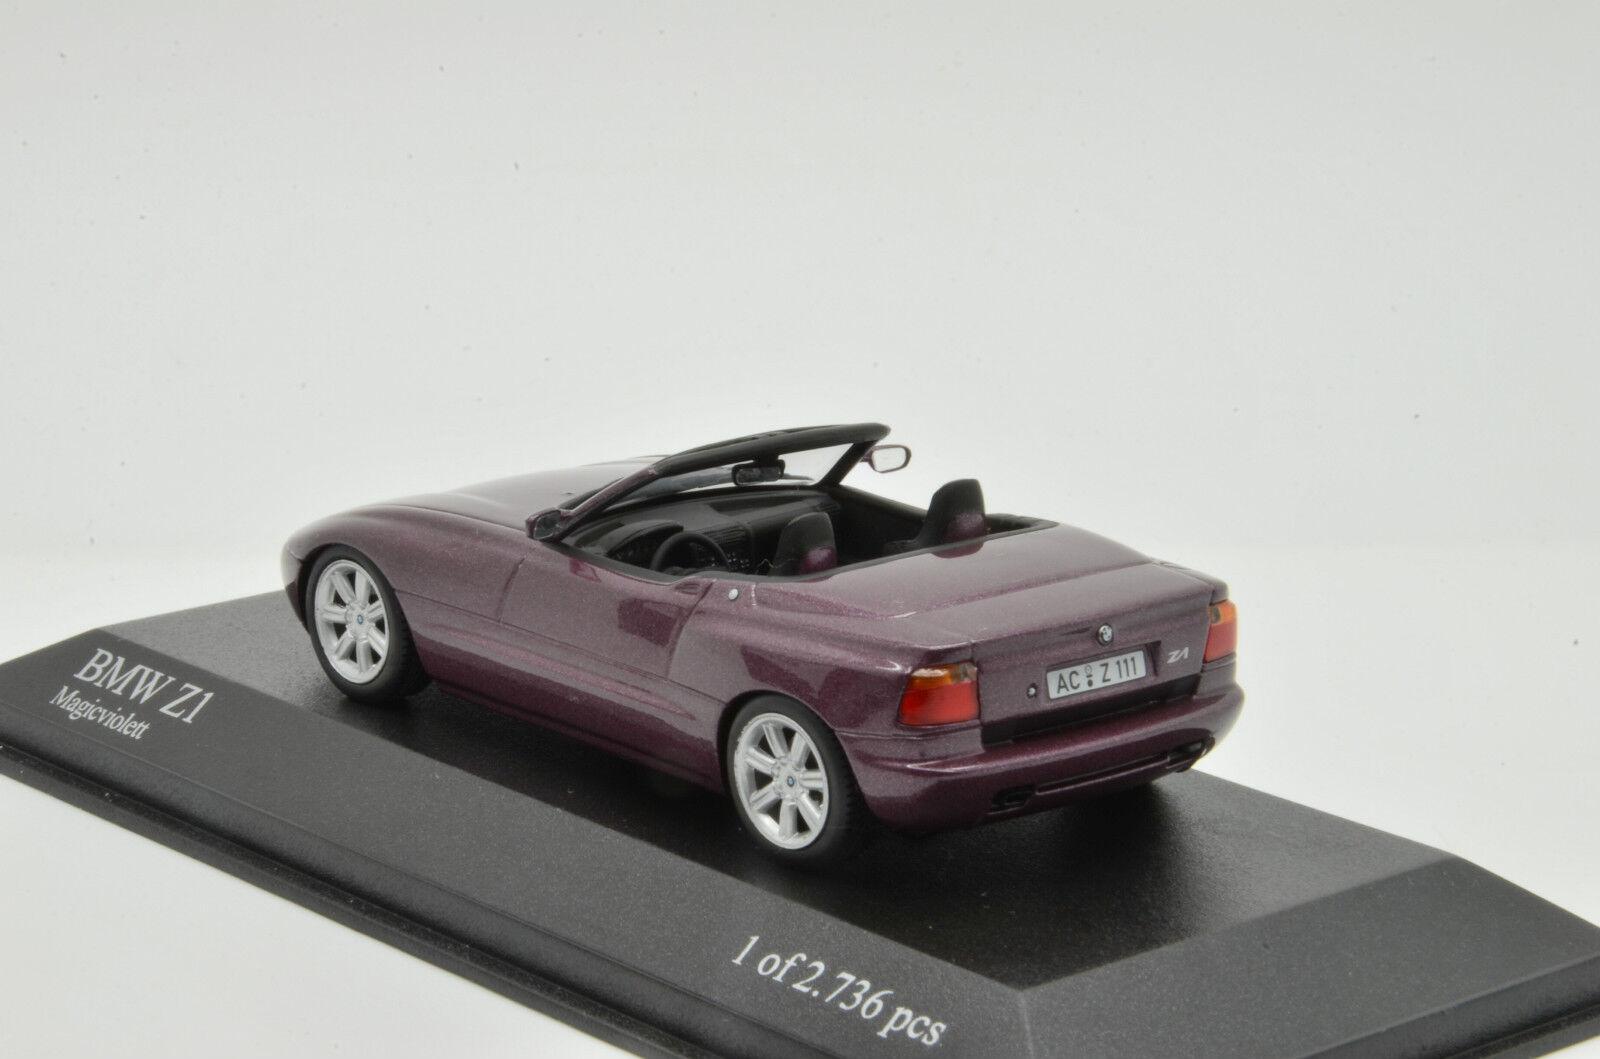 BMW Z1 1987 Purple Metallic Minichamps Minichamps Minichamps 020101 1 43 f7275b